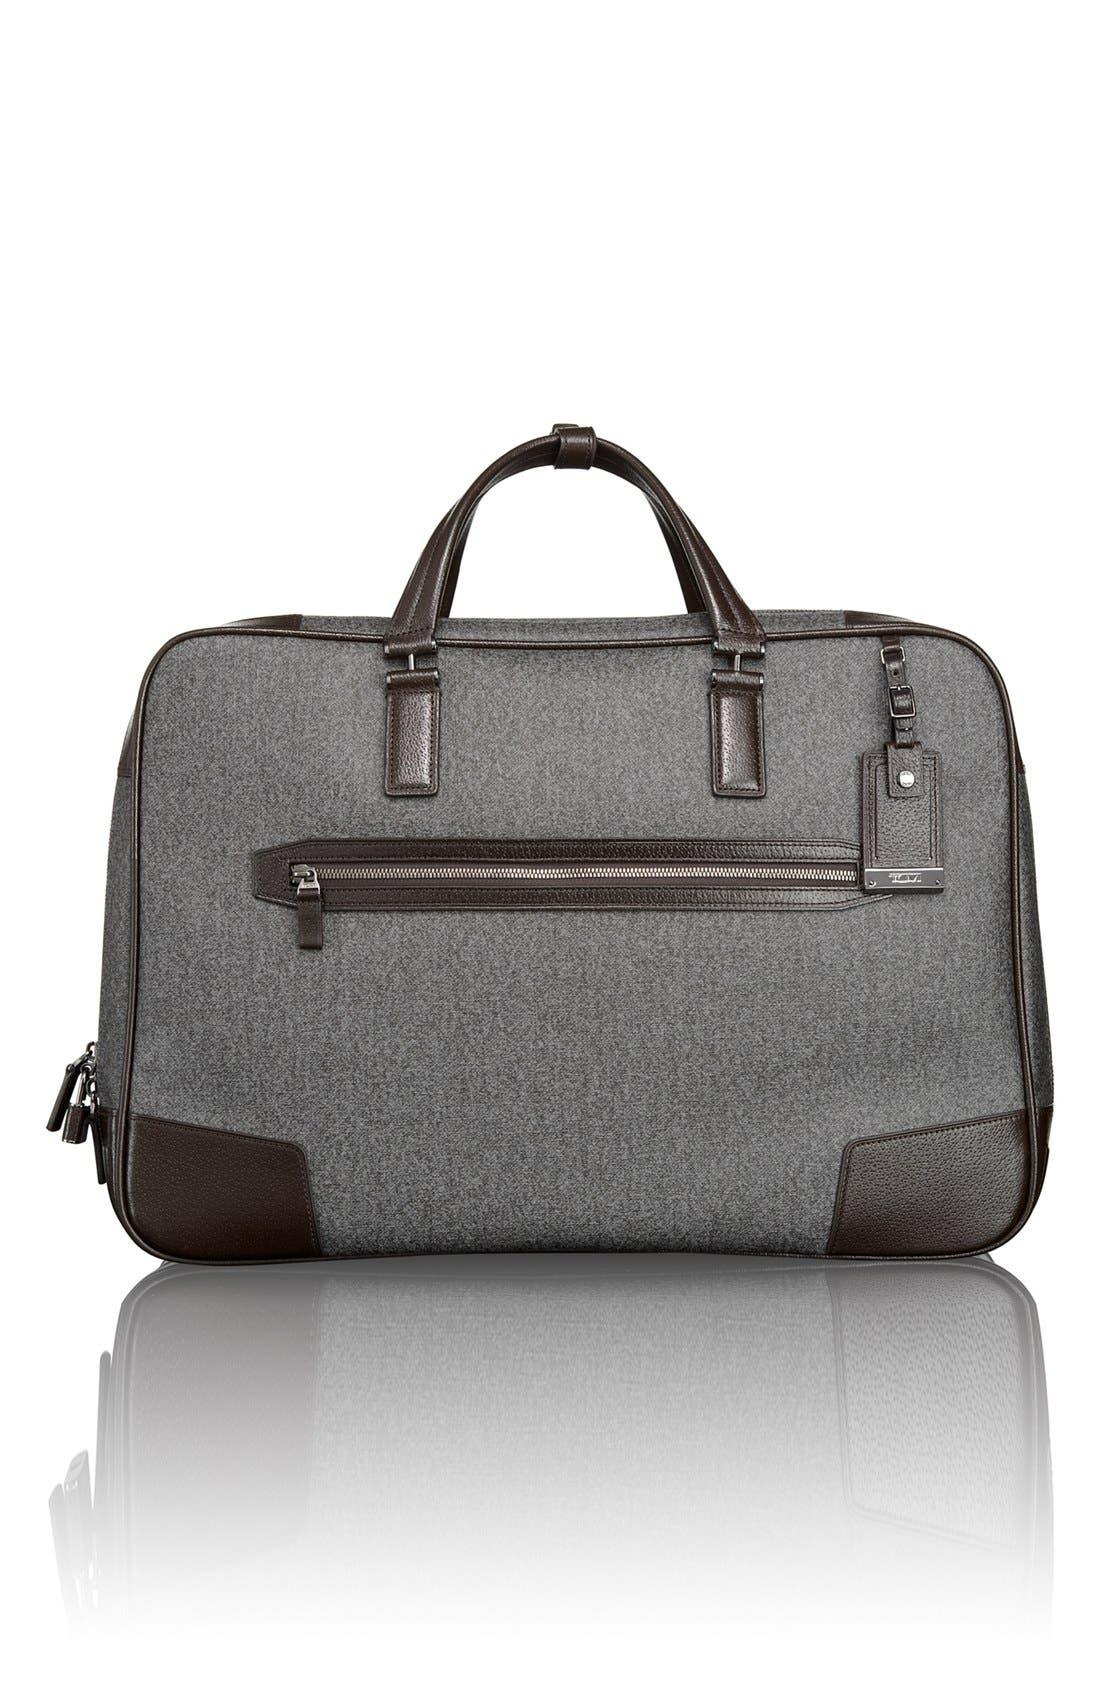 Main Image - Tumi 'Astor - Trinity' Softside Carry-On Bag (20 Inch)